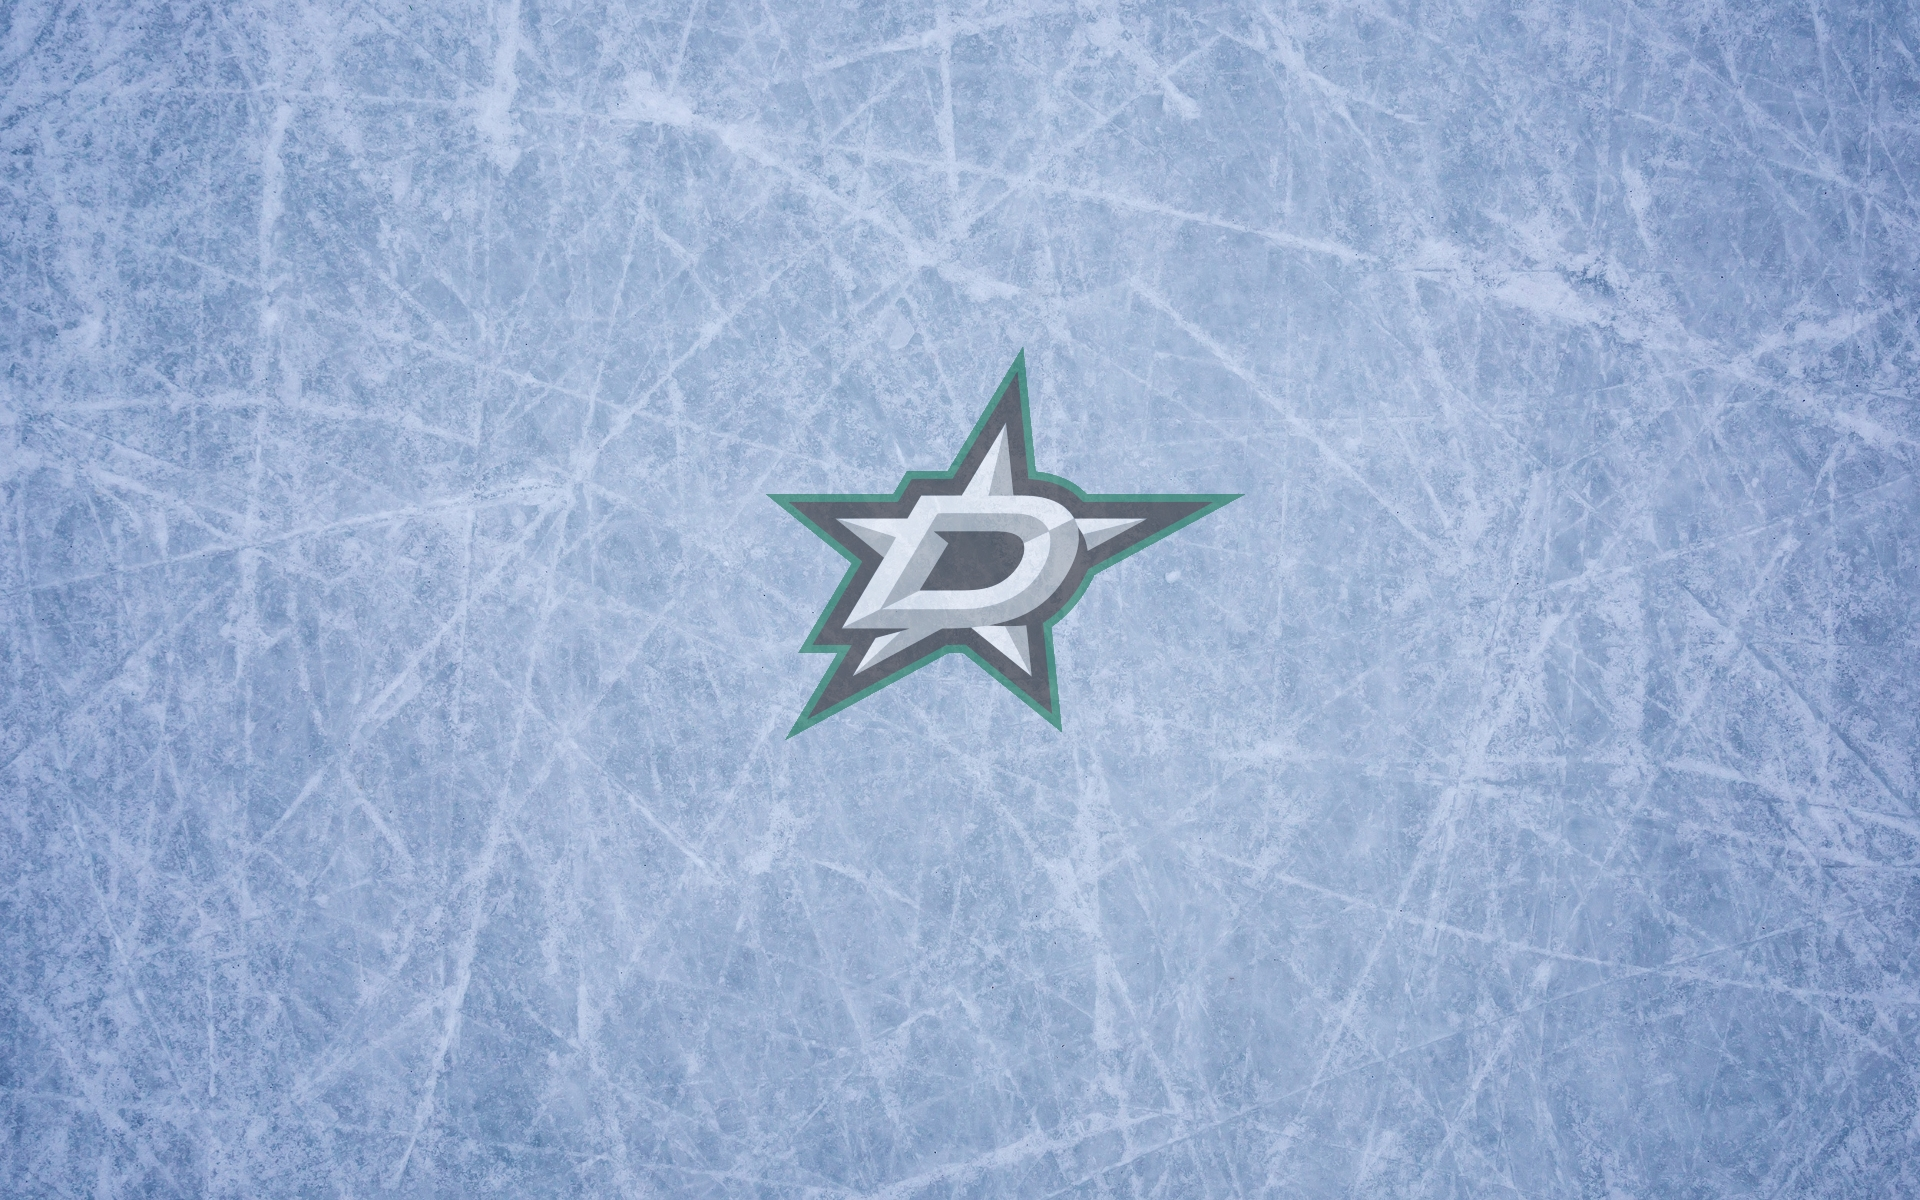 dallas stars logos download